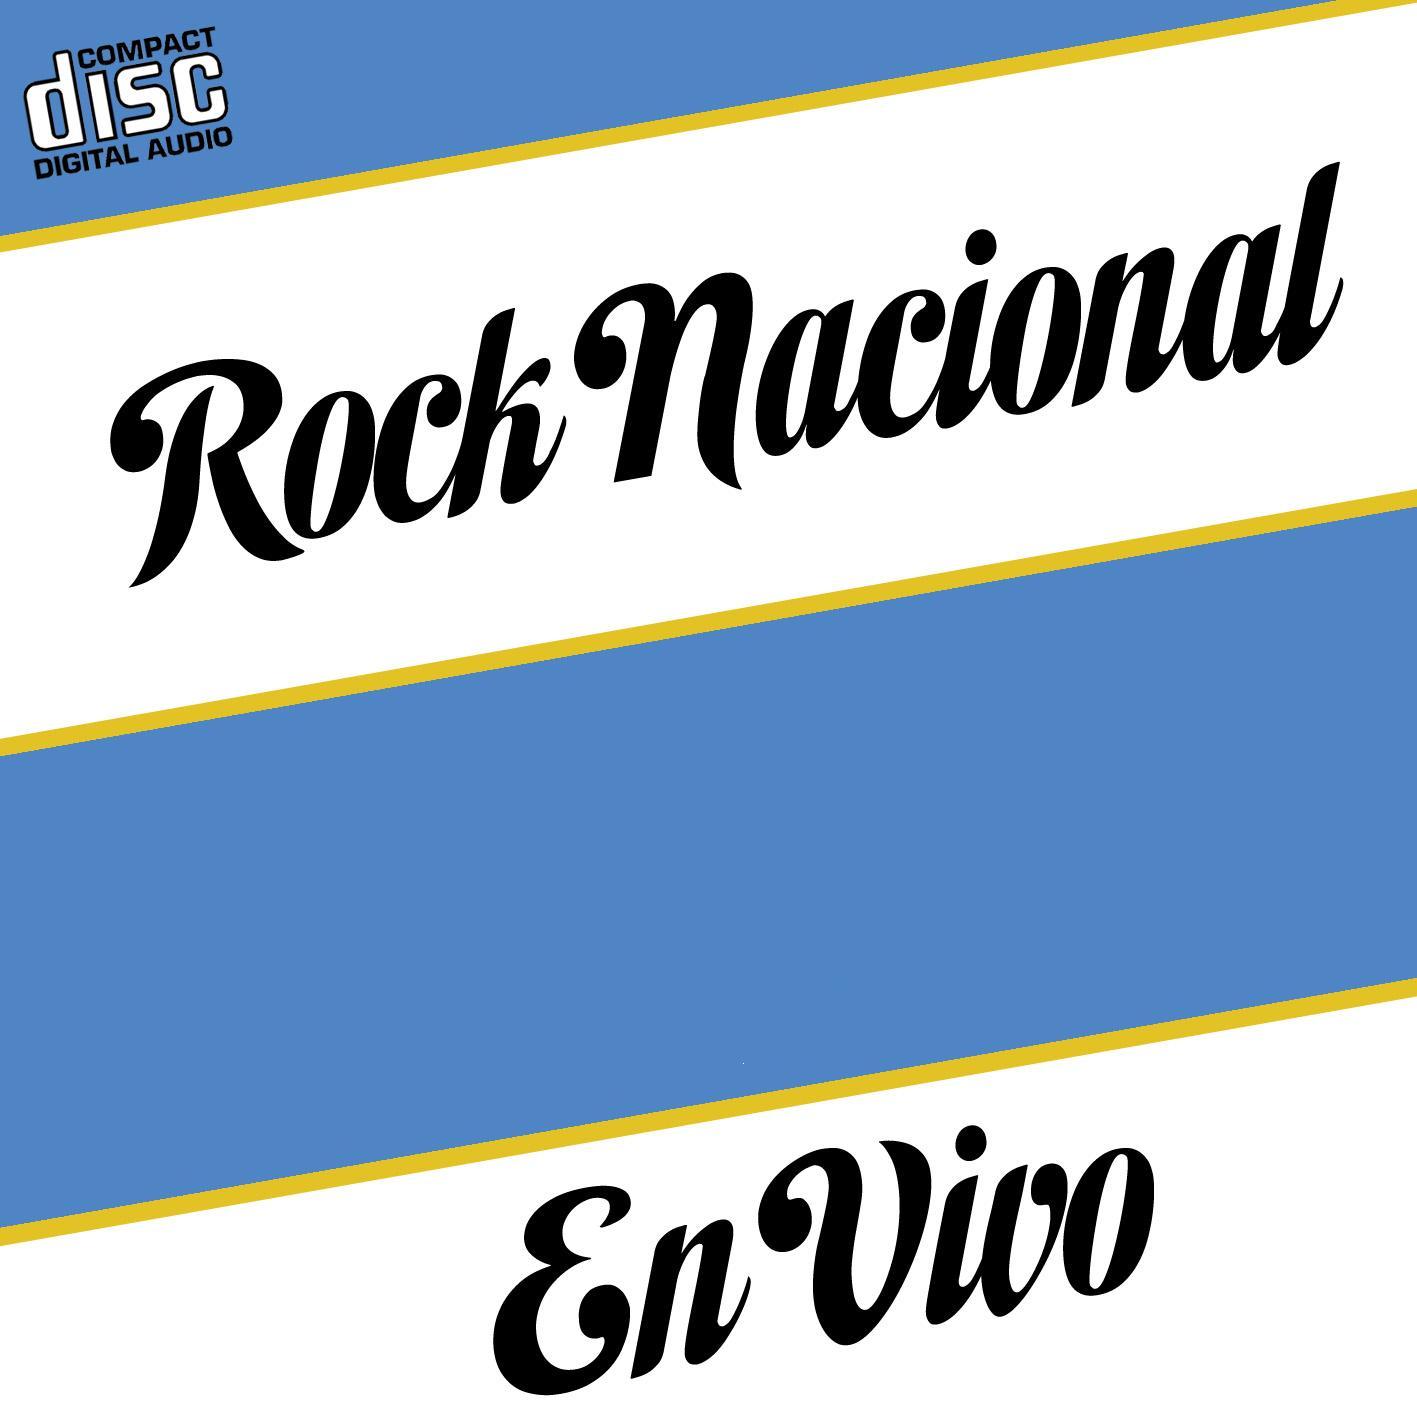 rock nacional online mi radio en vivo